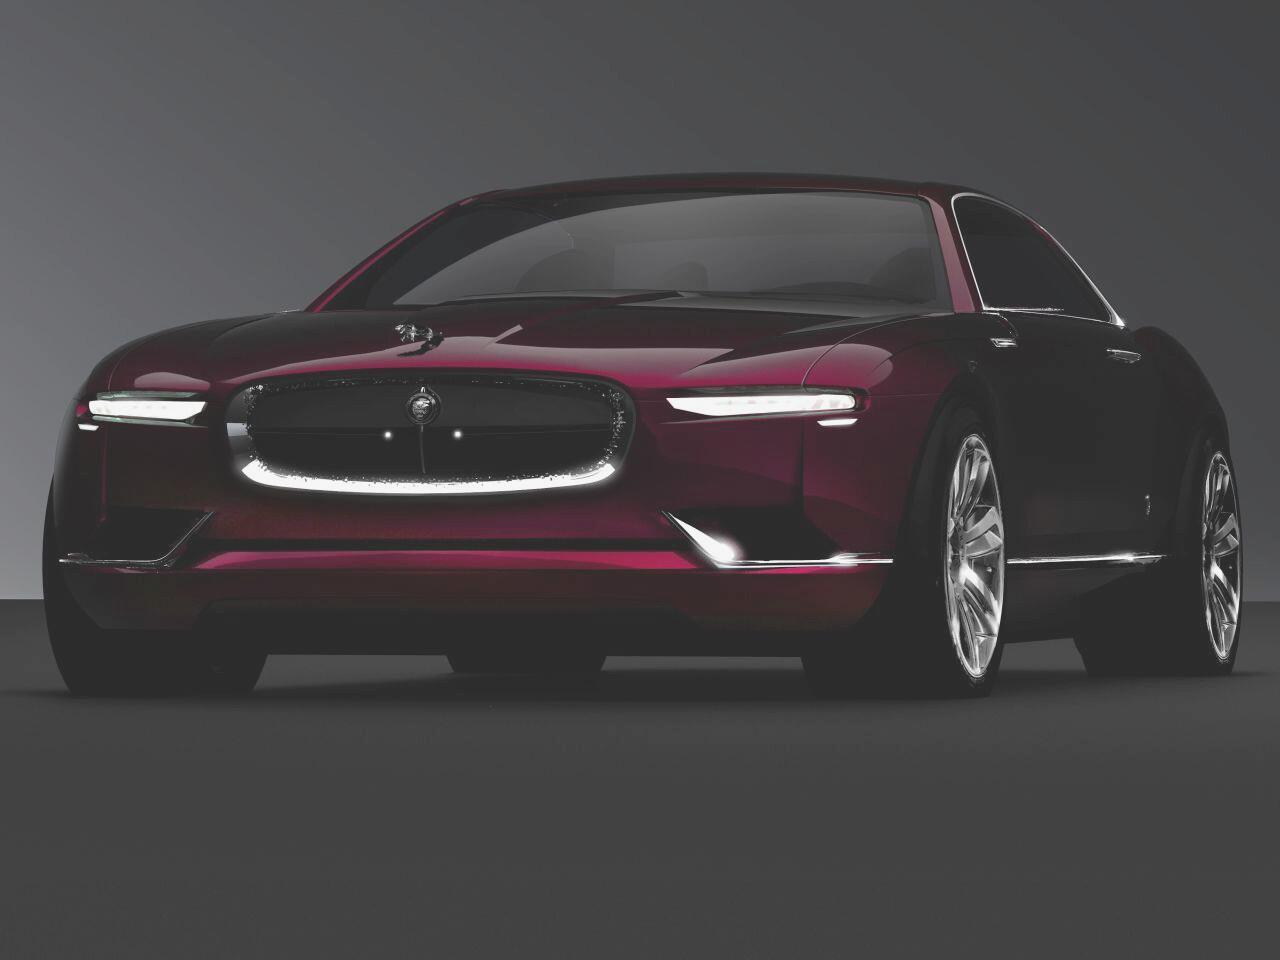 Bild zu B-Jaguar-B99-Concept-20111